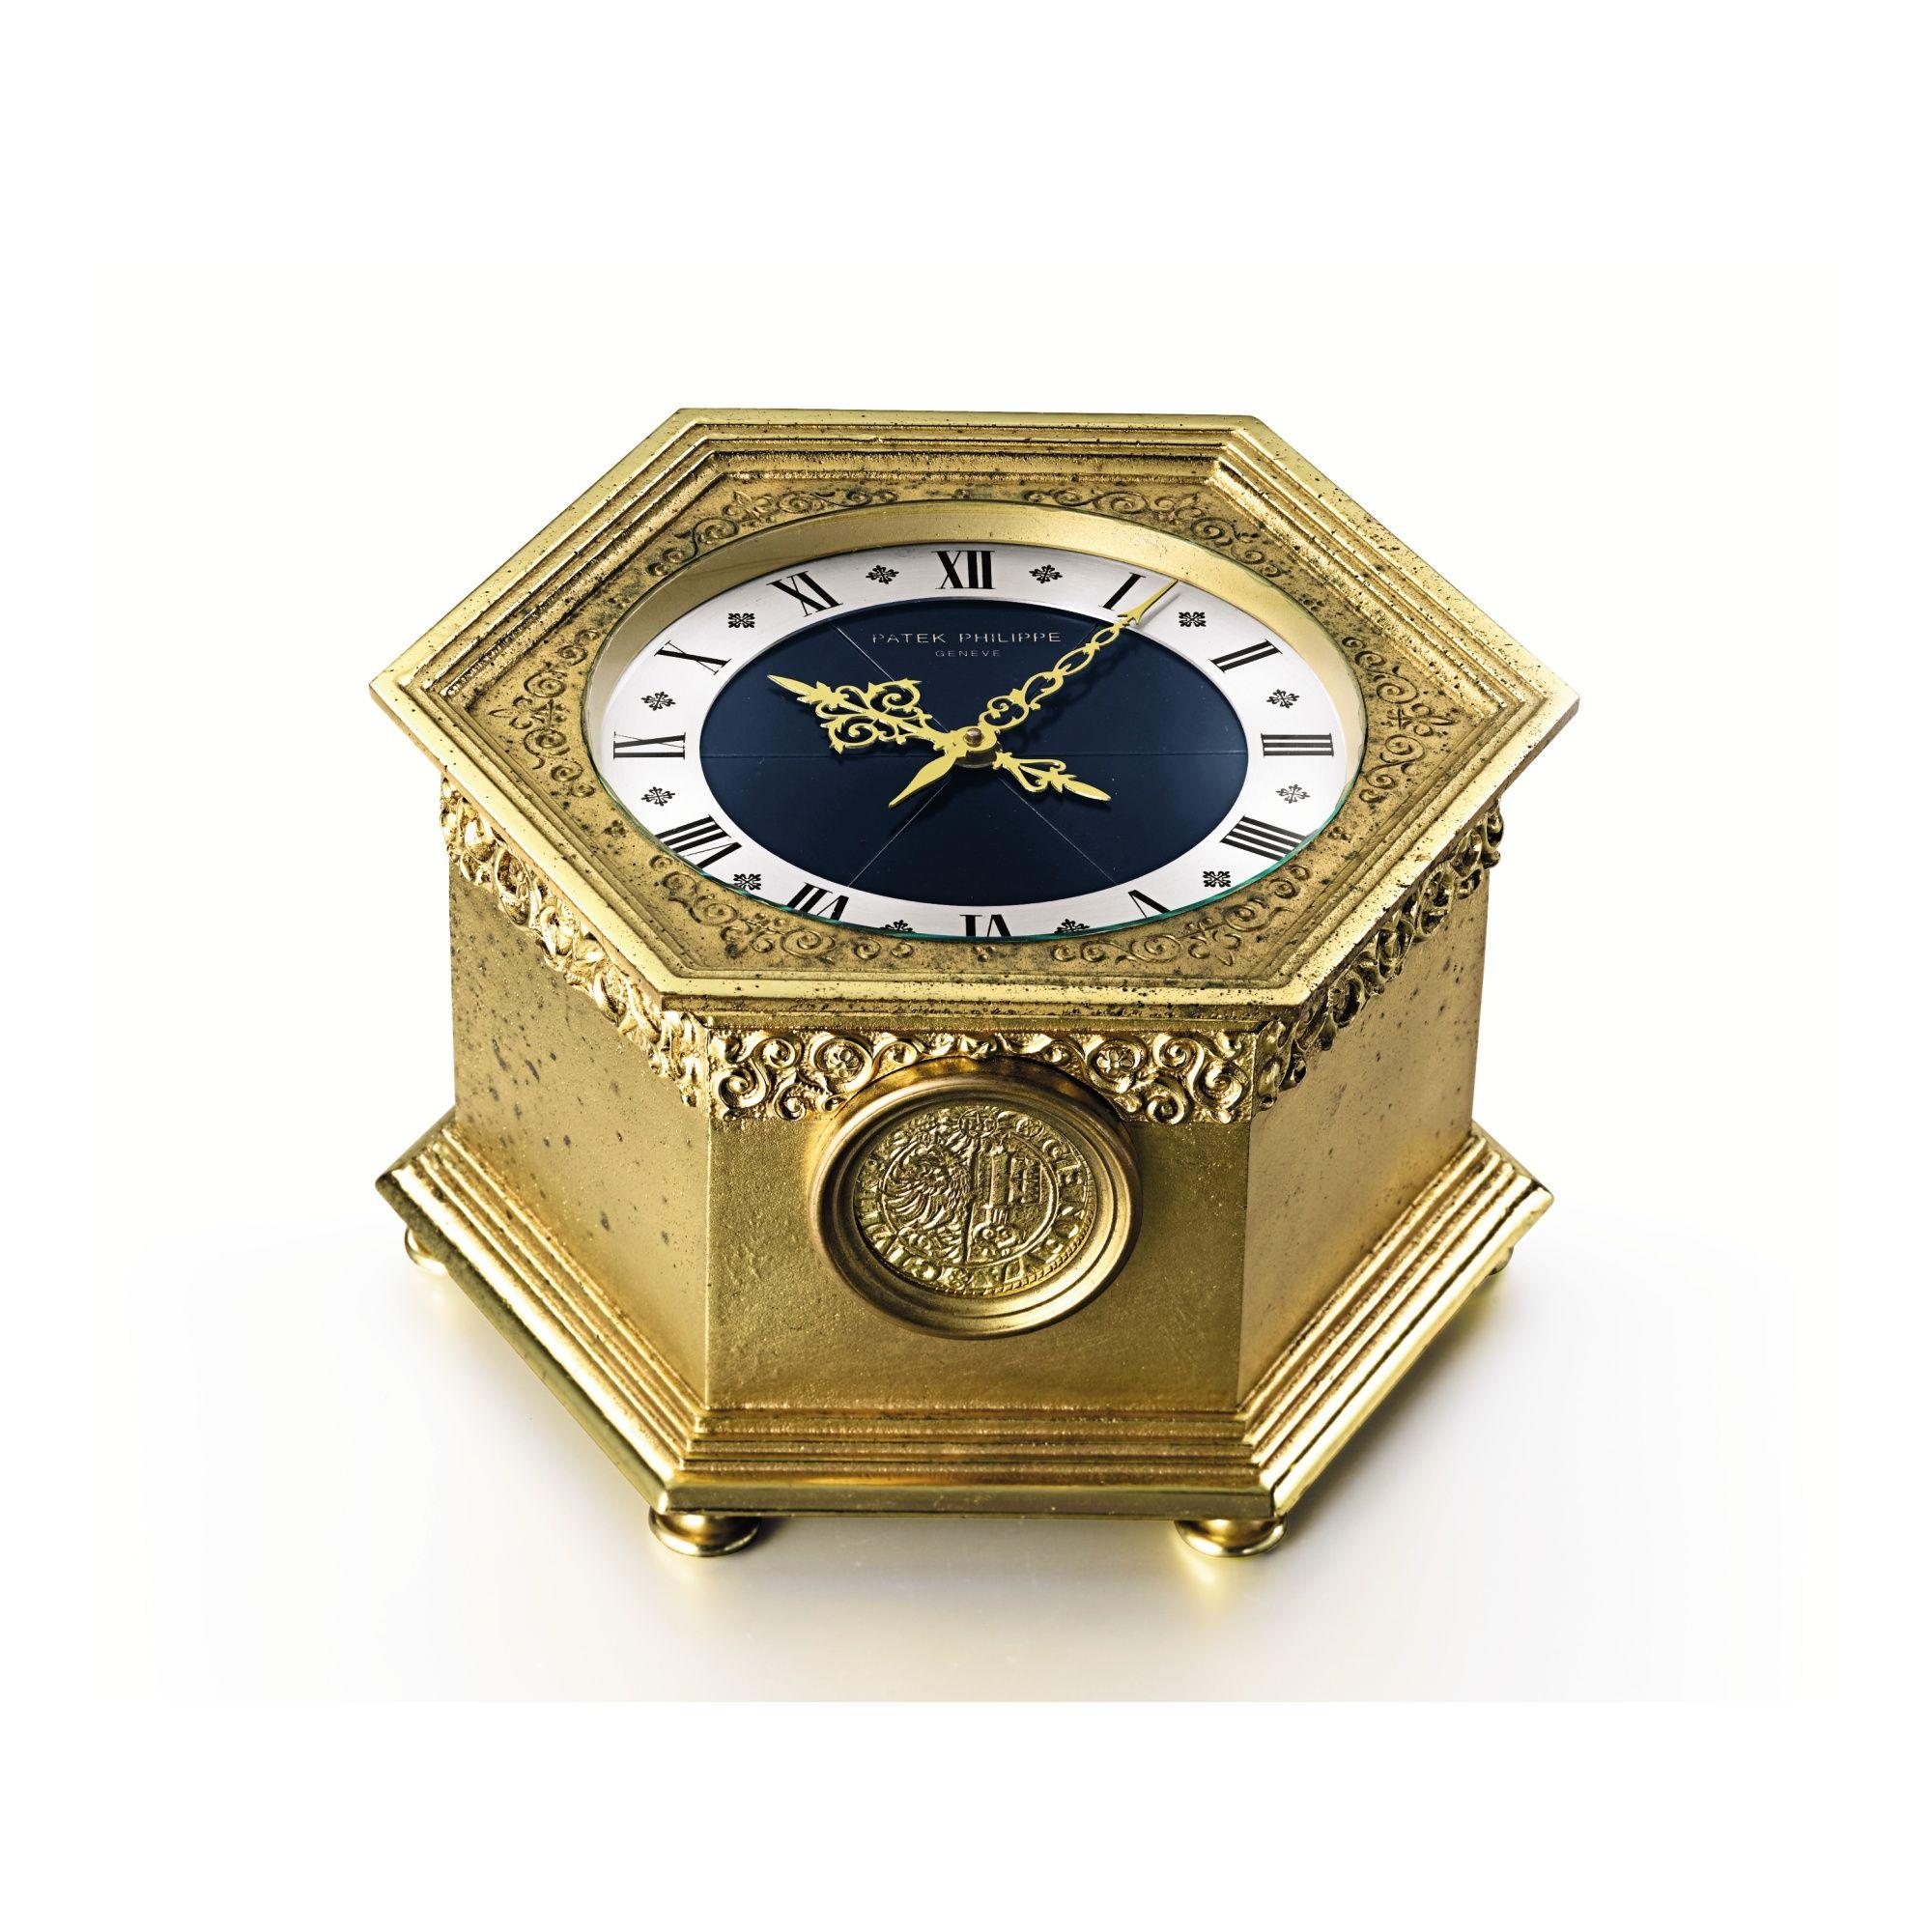 PATEK PHILIPPE A GILT BRASS HEXAGONAL SOLAR POWERED QUARTZ TABLE CLOCK 1976 CASE 1800331